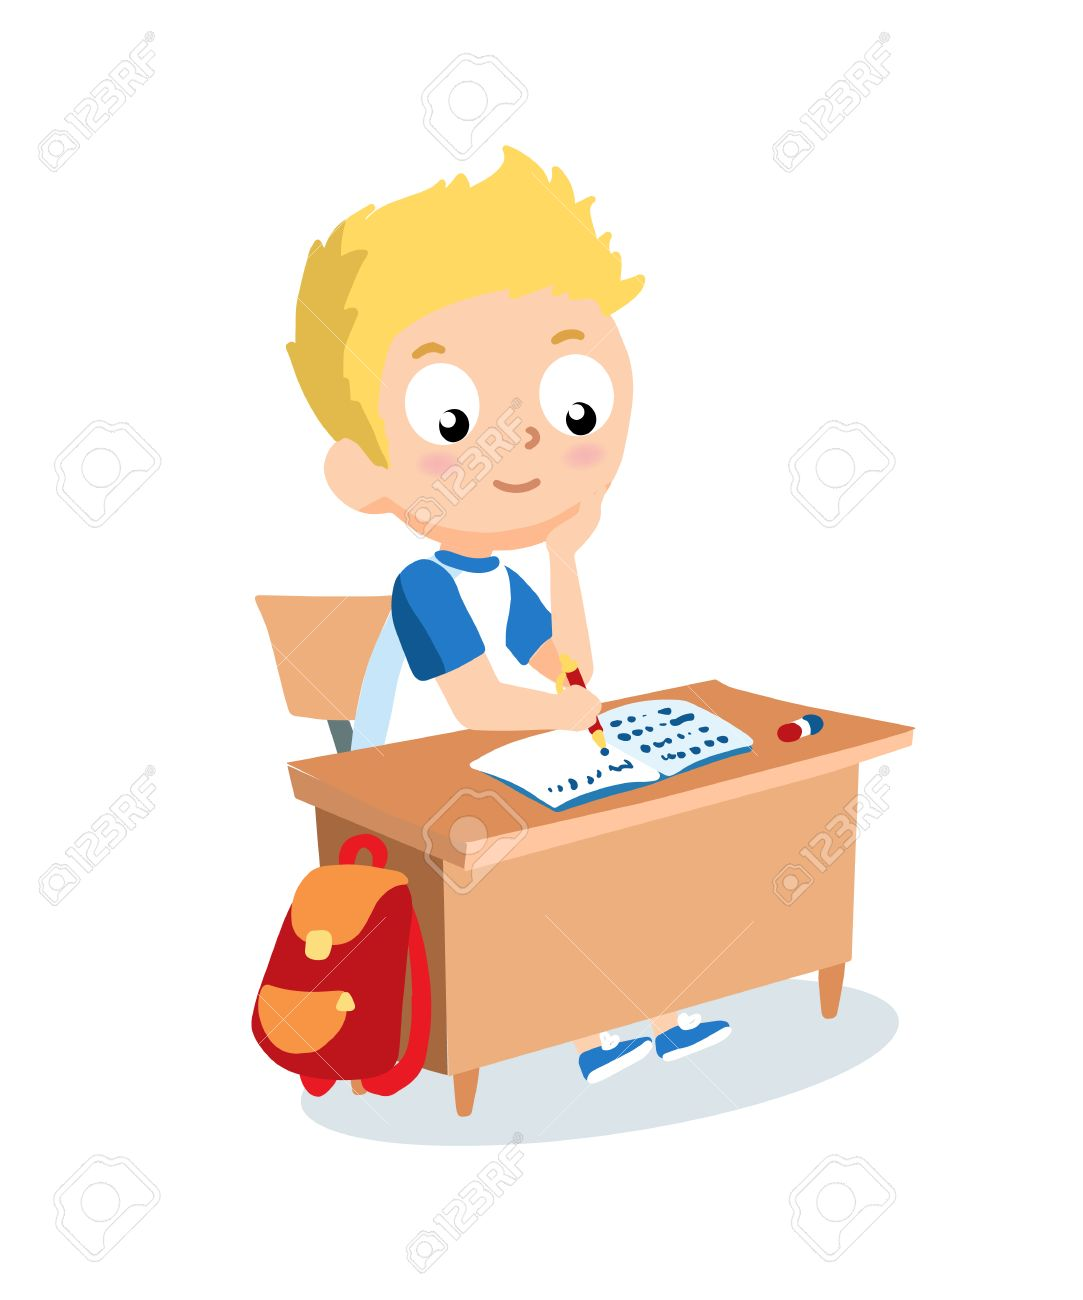 Tisch schule clipart  Schüler In Der Schule Schreibtisch Sitzen. Schüler Vektor-Cartoon ...